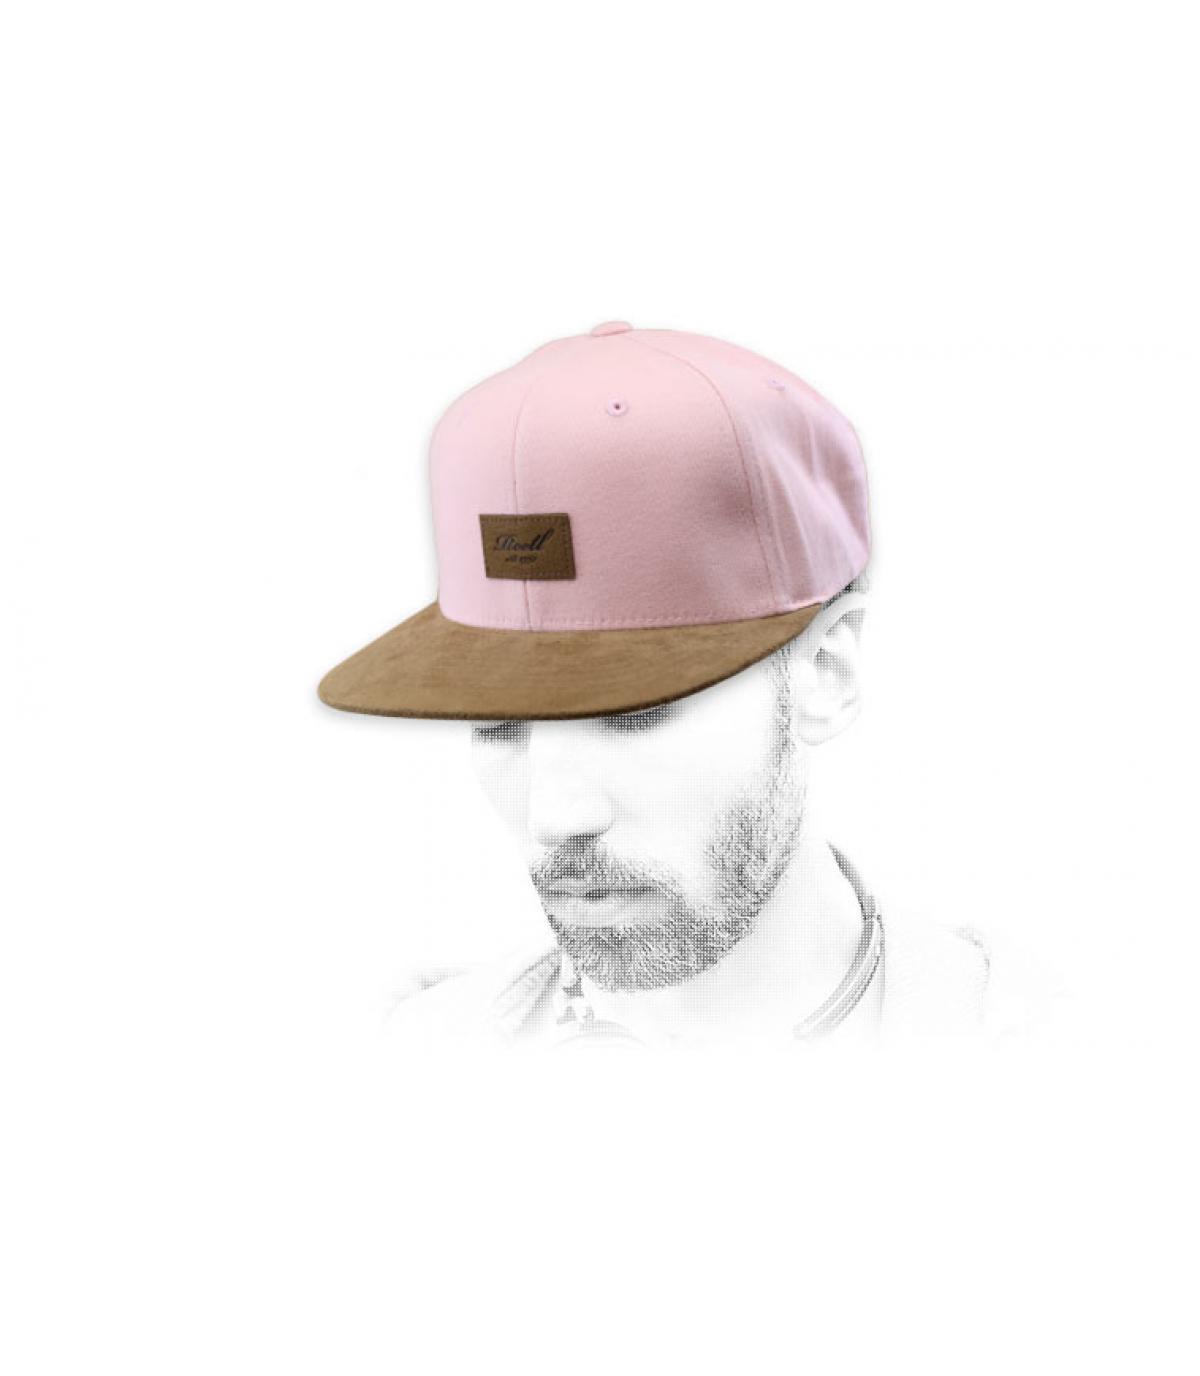 Reell snapback pink suede